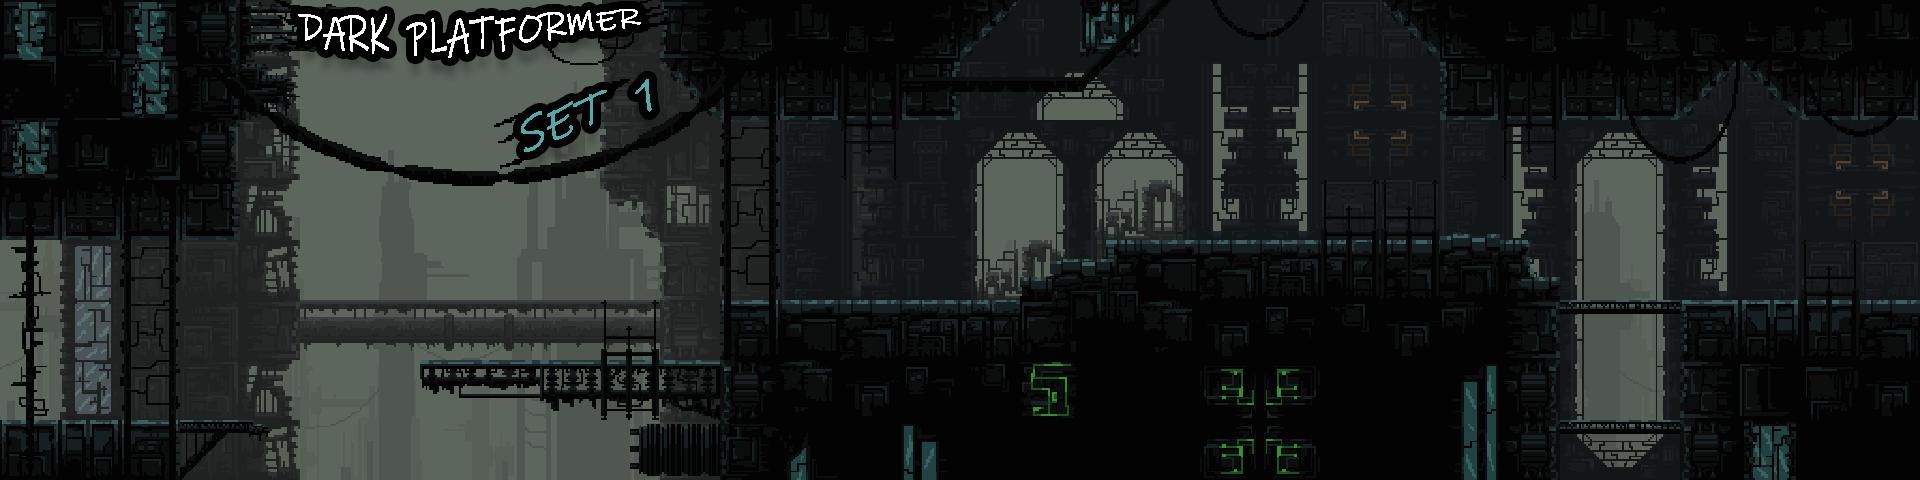 Dark Platformer Set1